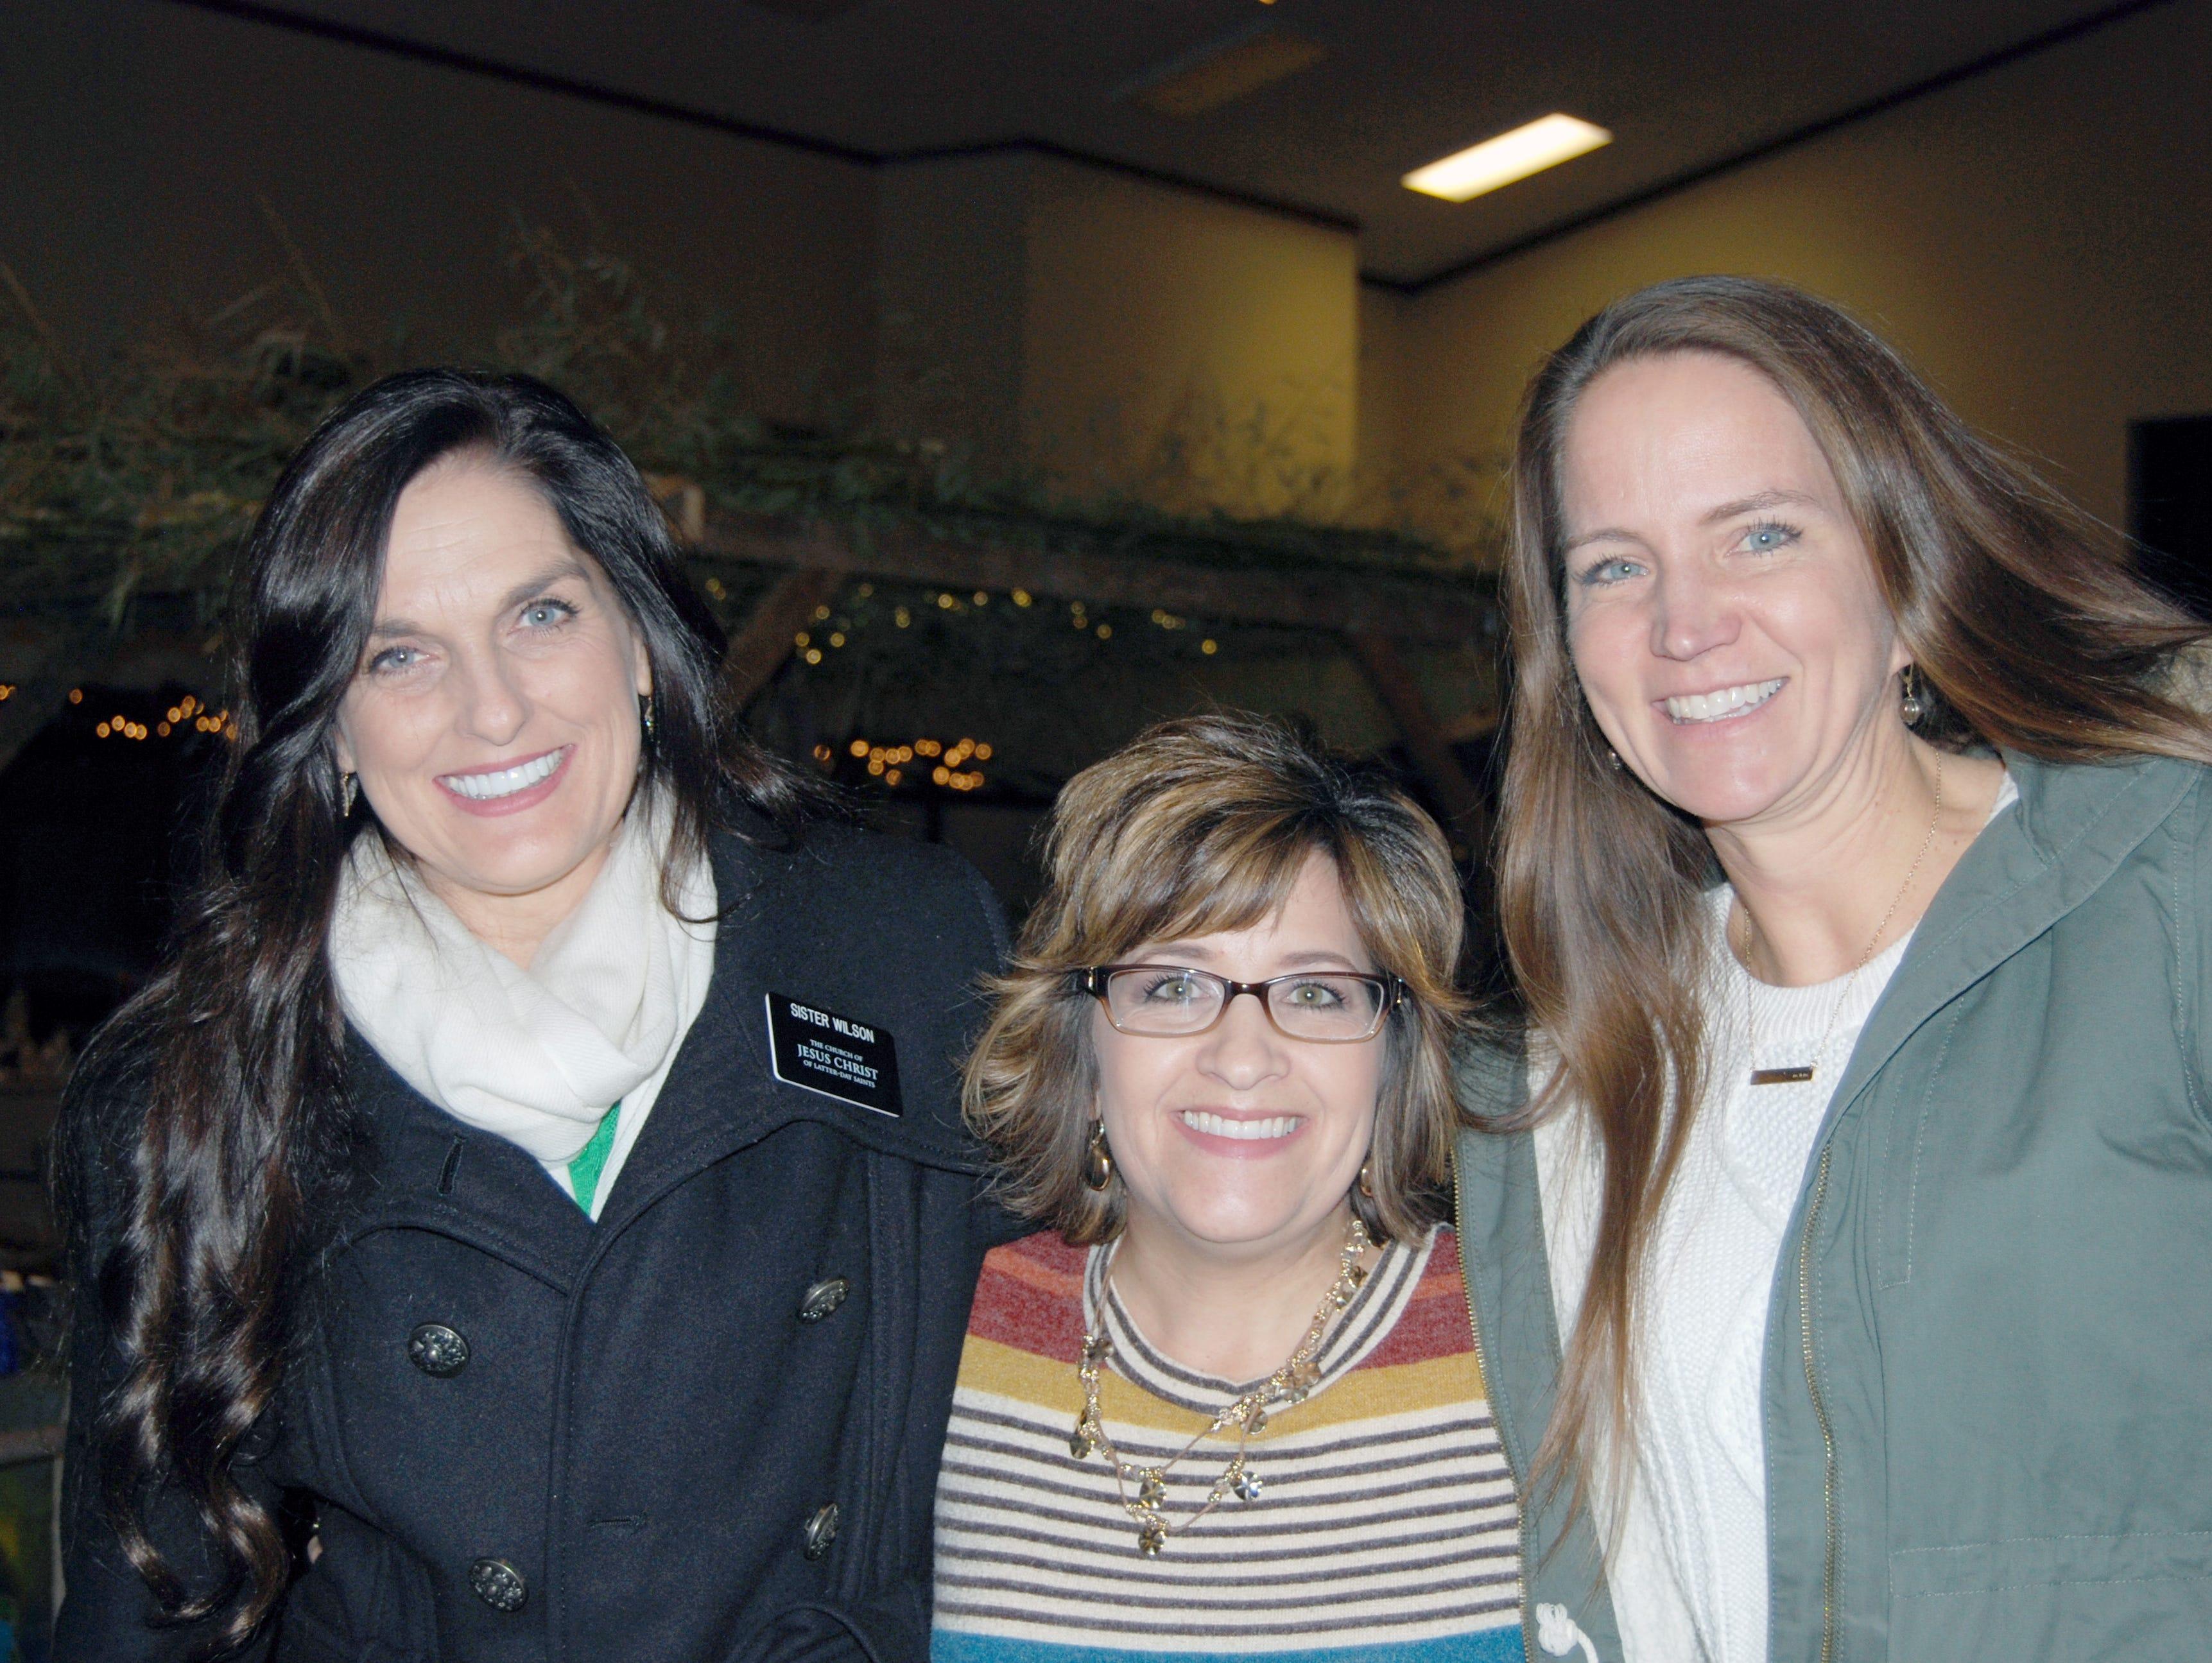 Sister Wilson, Karla Wallentine and Kerry Scott